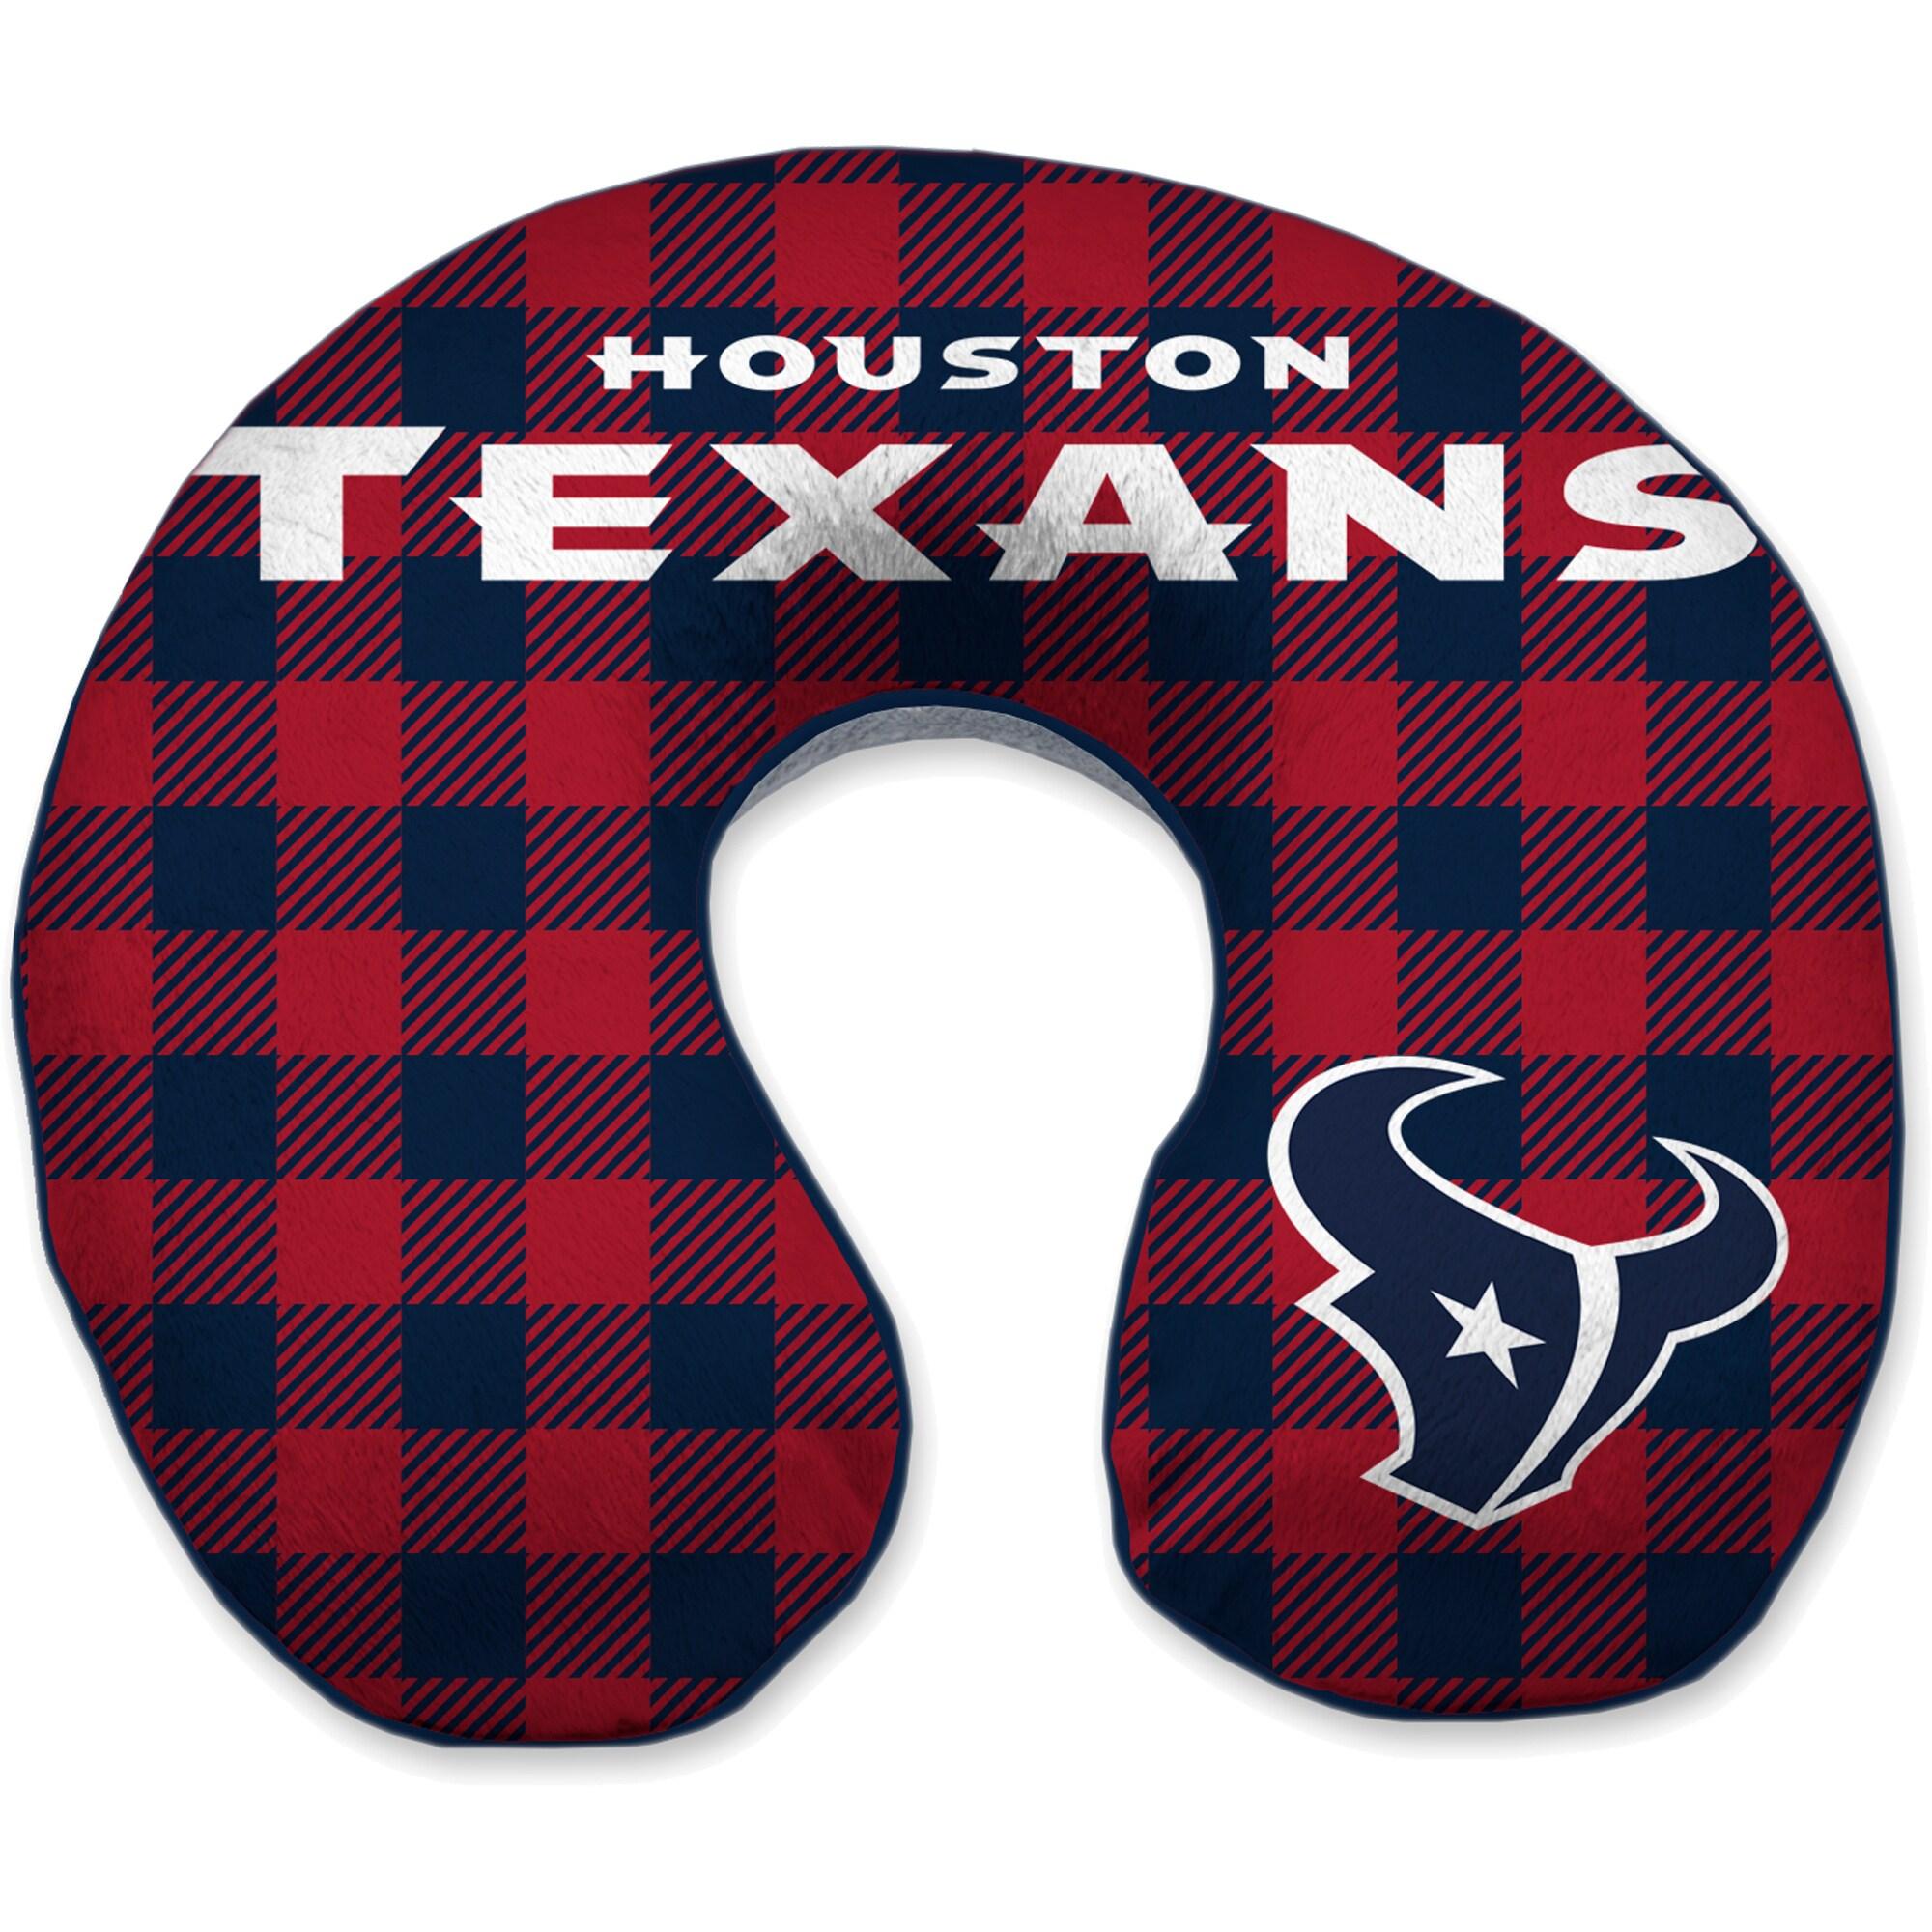 Houston Texans Buffalo Check Sherpa Memory Foam Travel Pillow - Blue